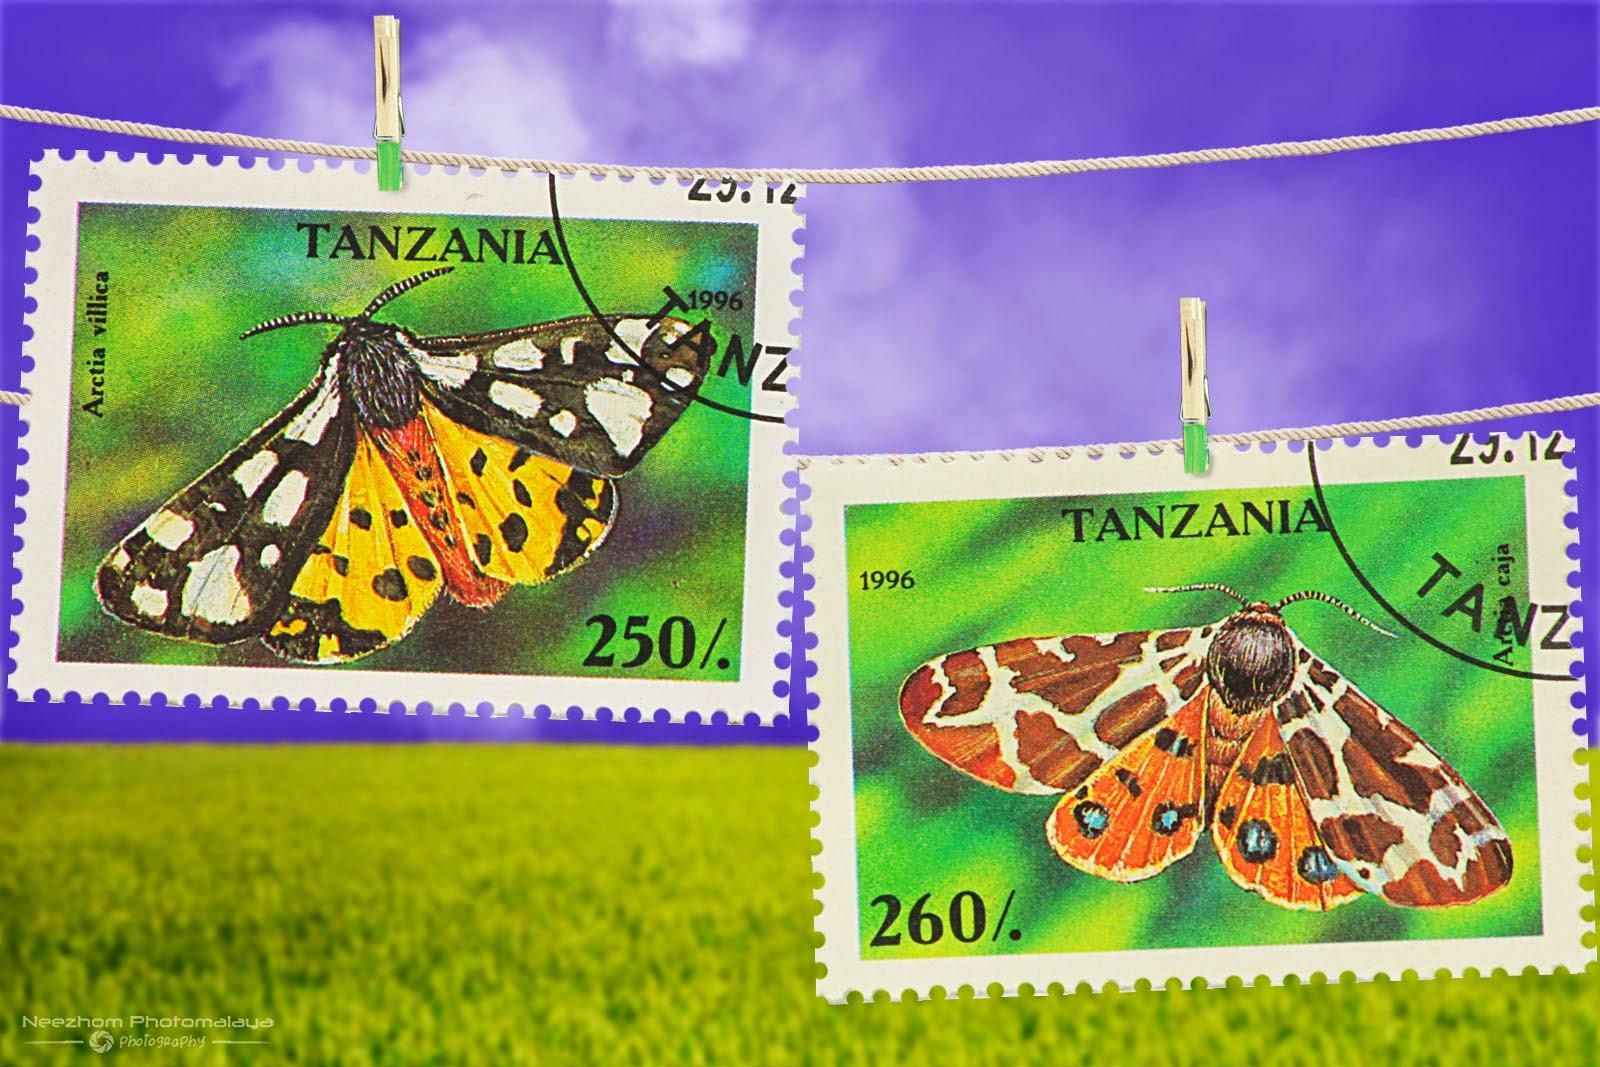 Tanzania Moth stamps 1996 - Arctia villica, Arctia caja